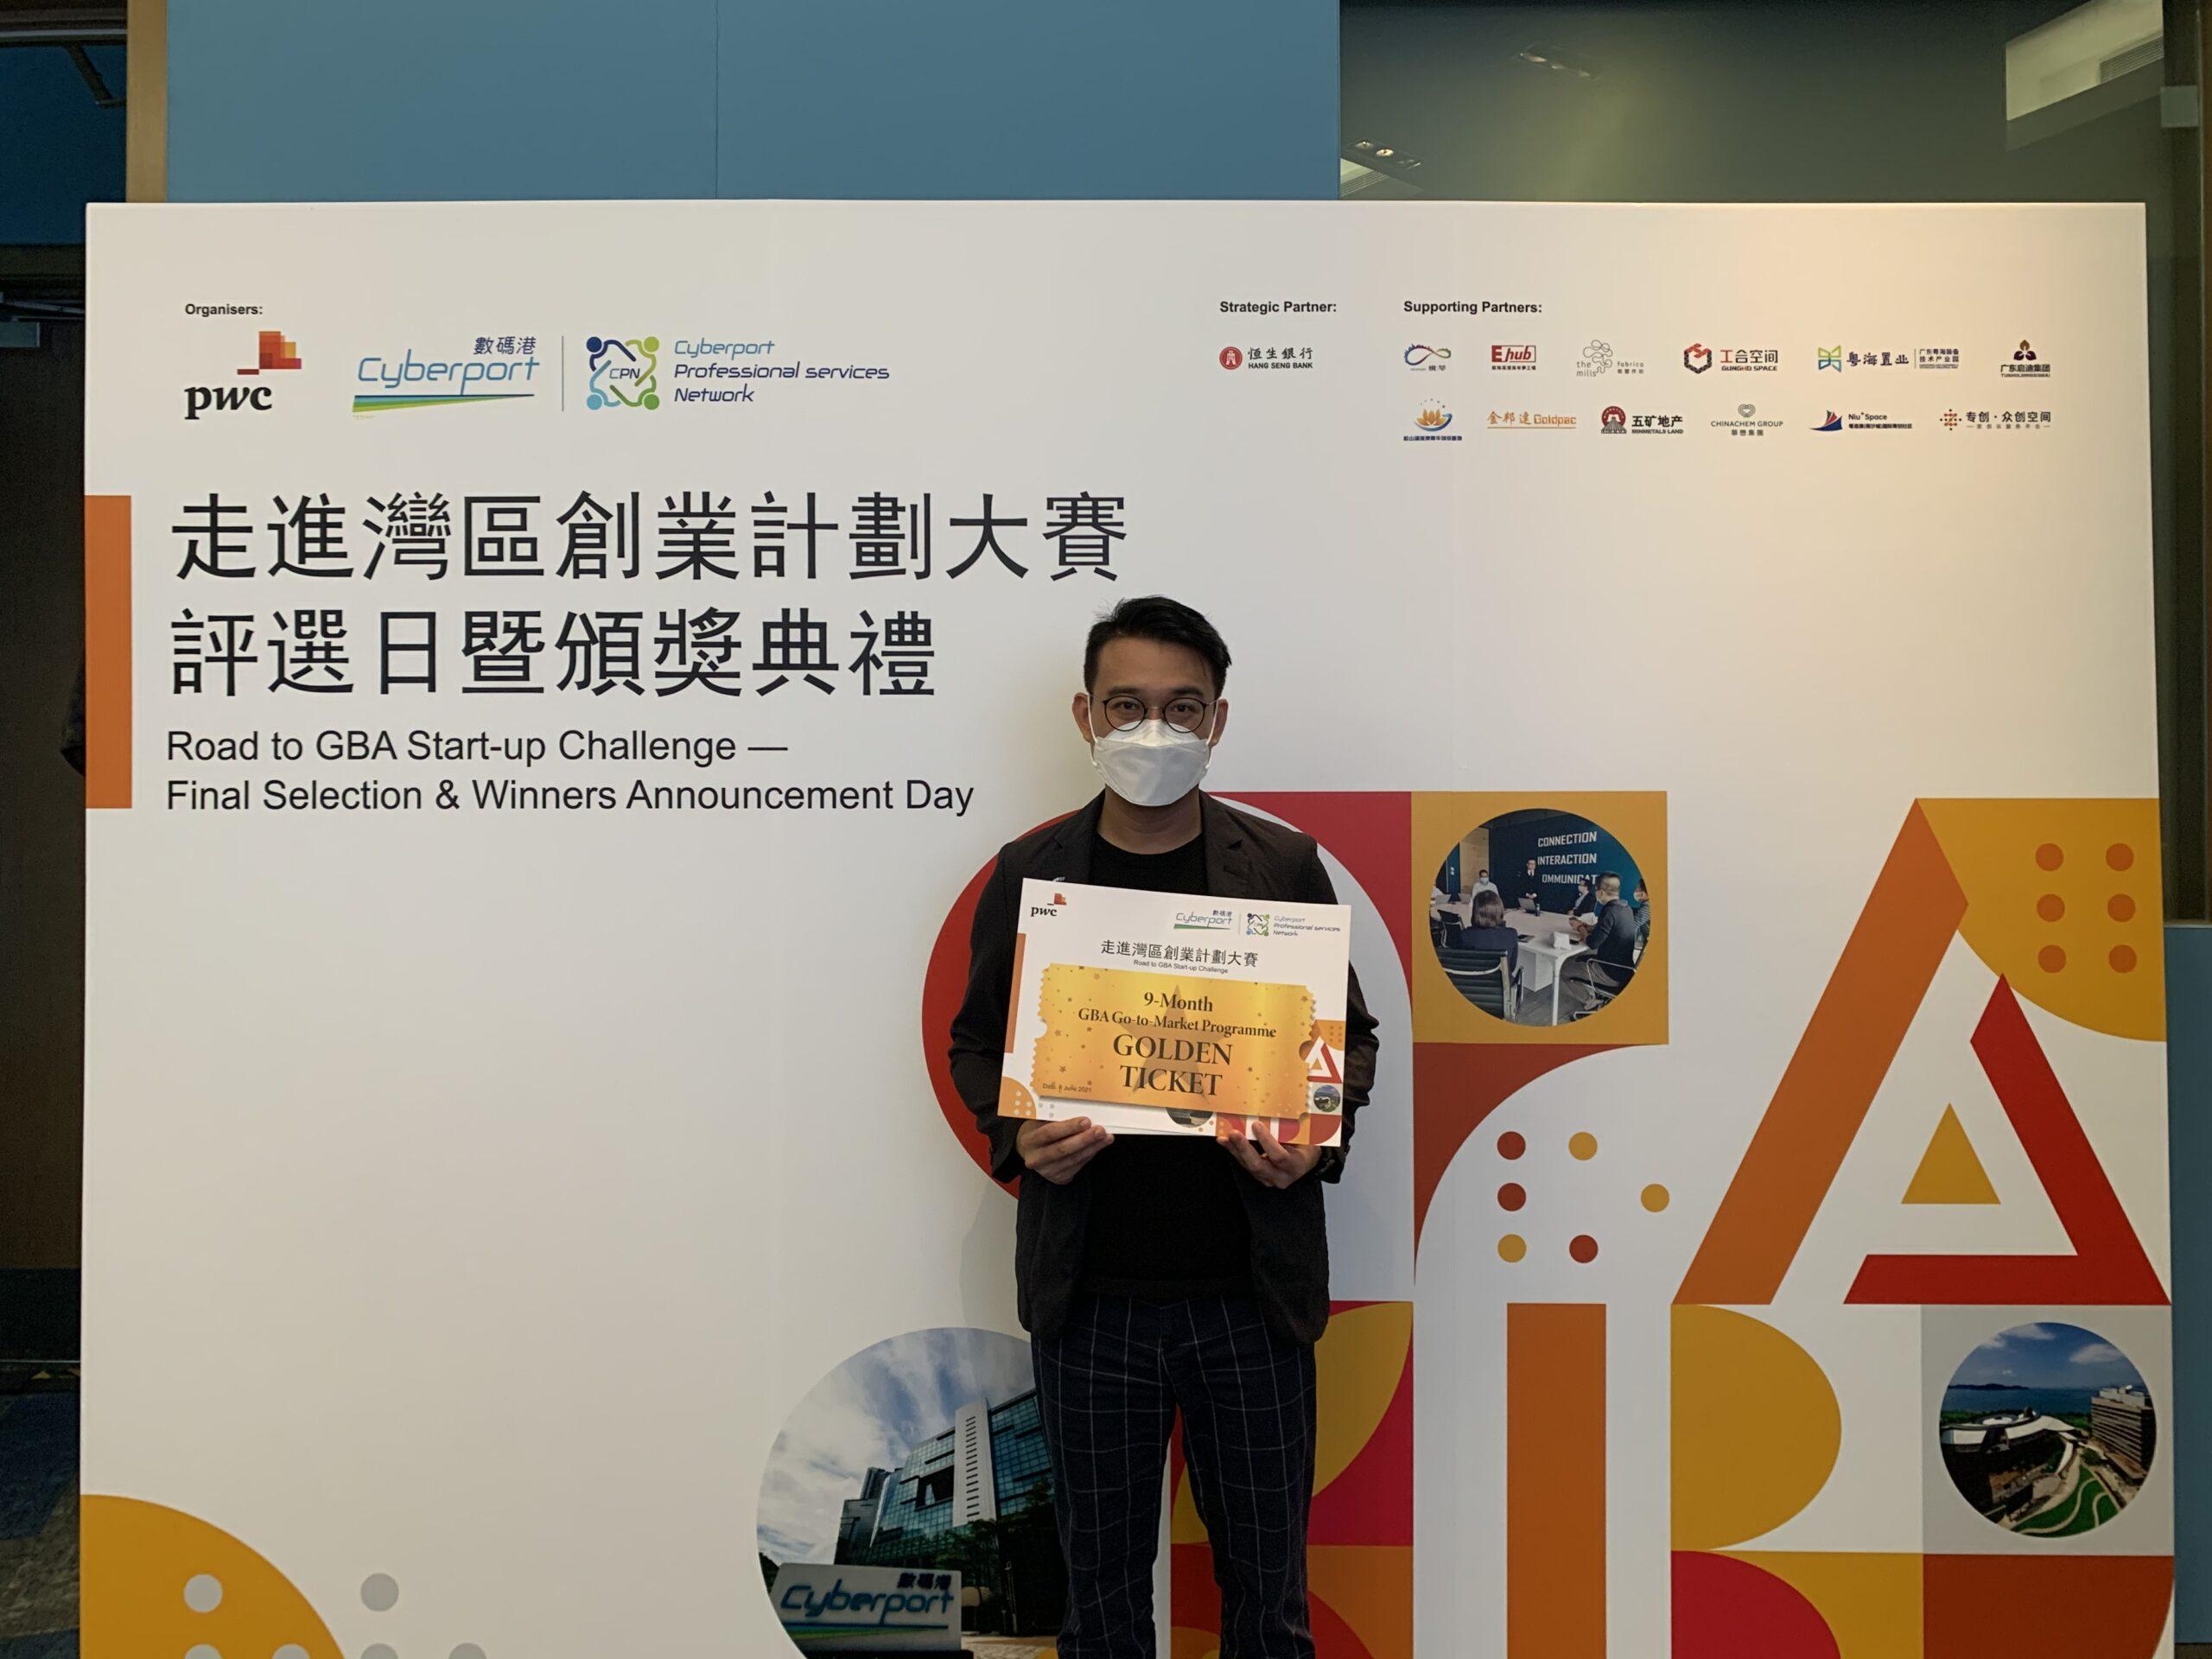 Road to GBA Cyberport x PwC, Winning Company